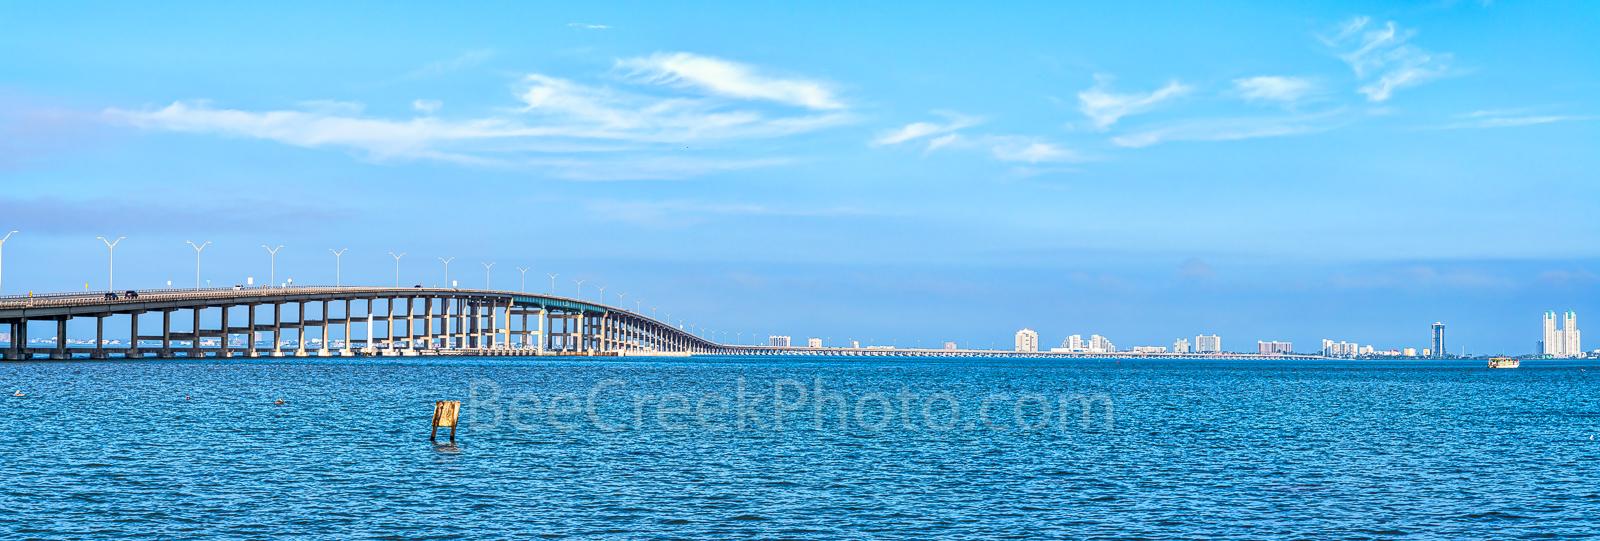 Queen Isabella Bridge, South Padre island, south padre, pano, panorama, bridge, landmark,, photo